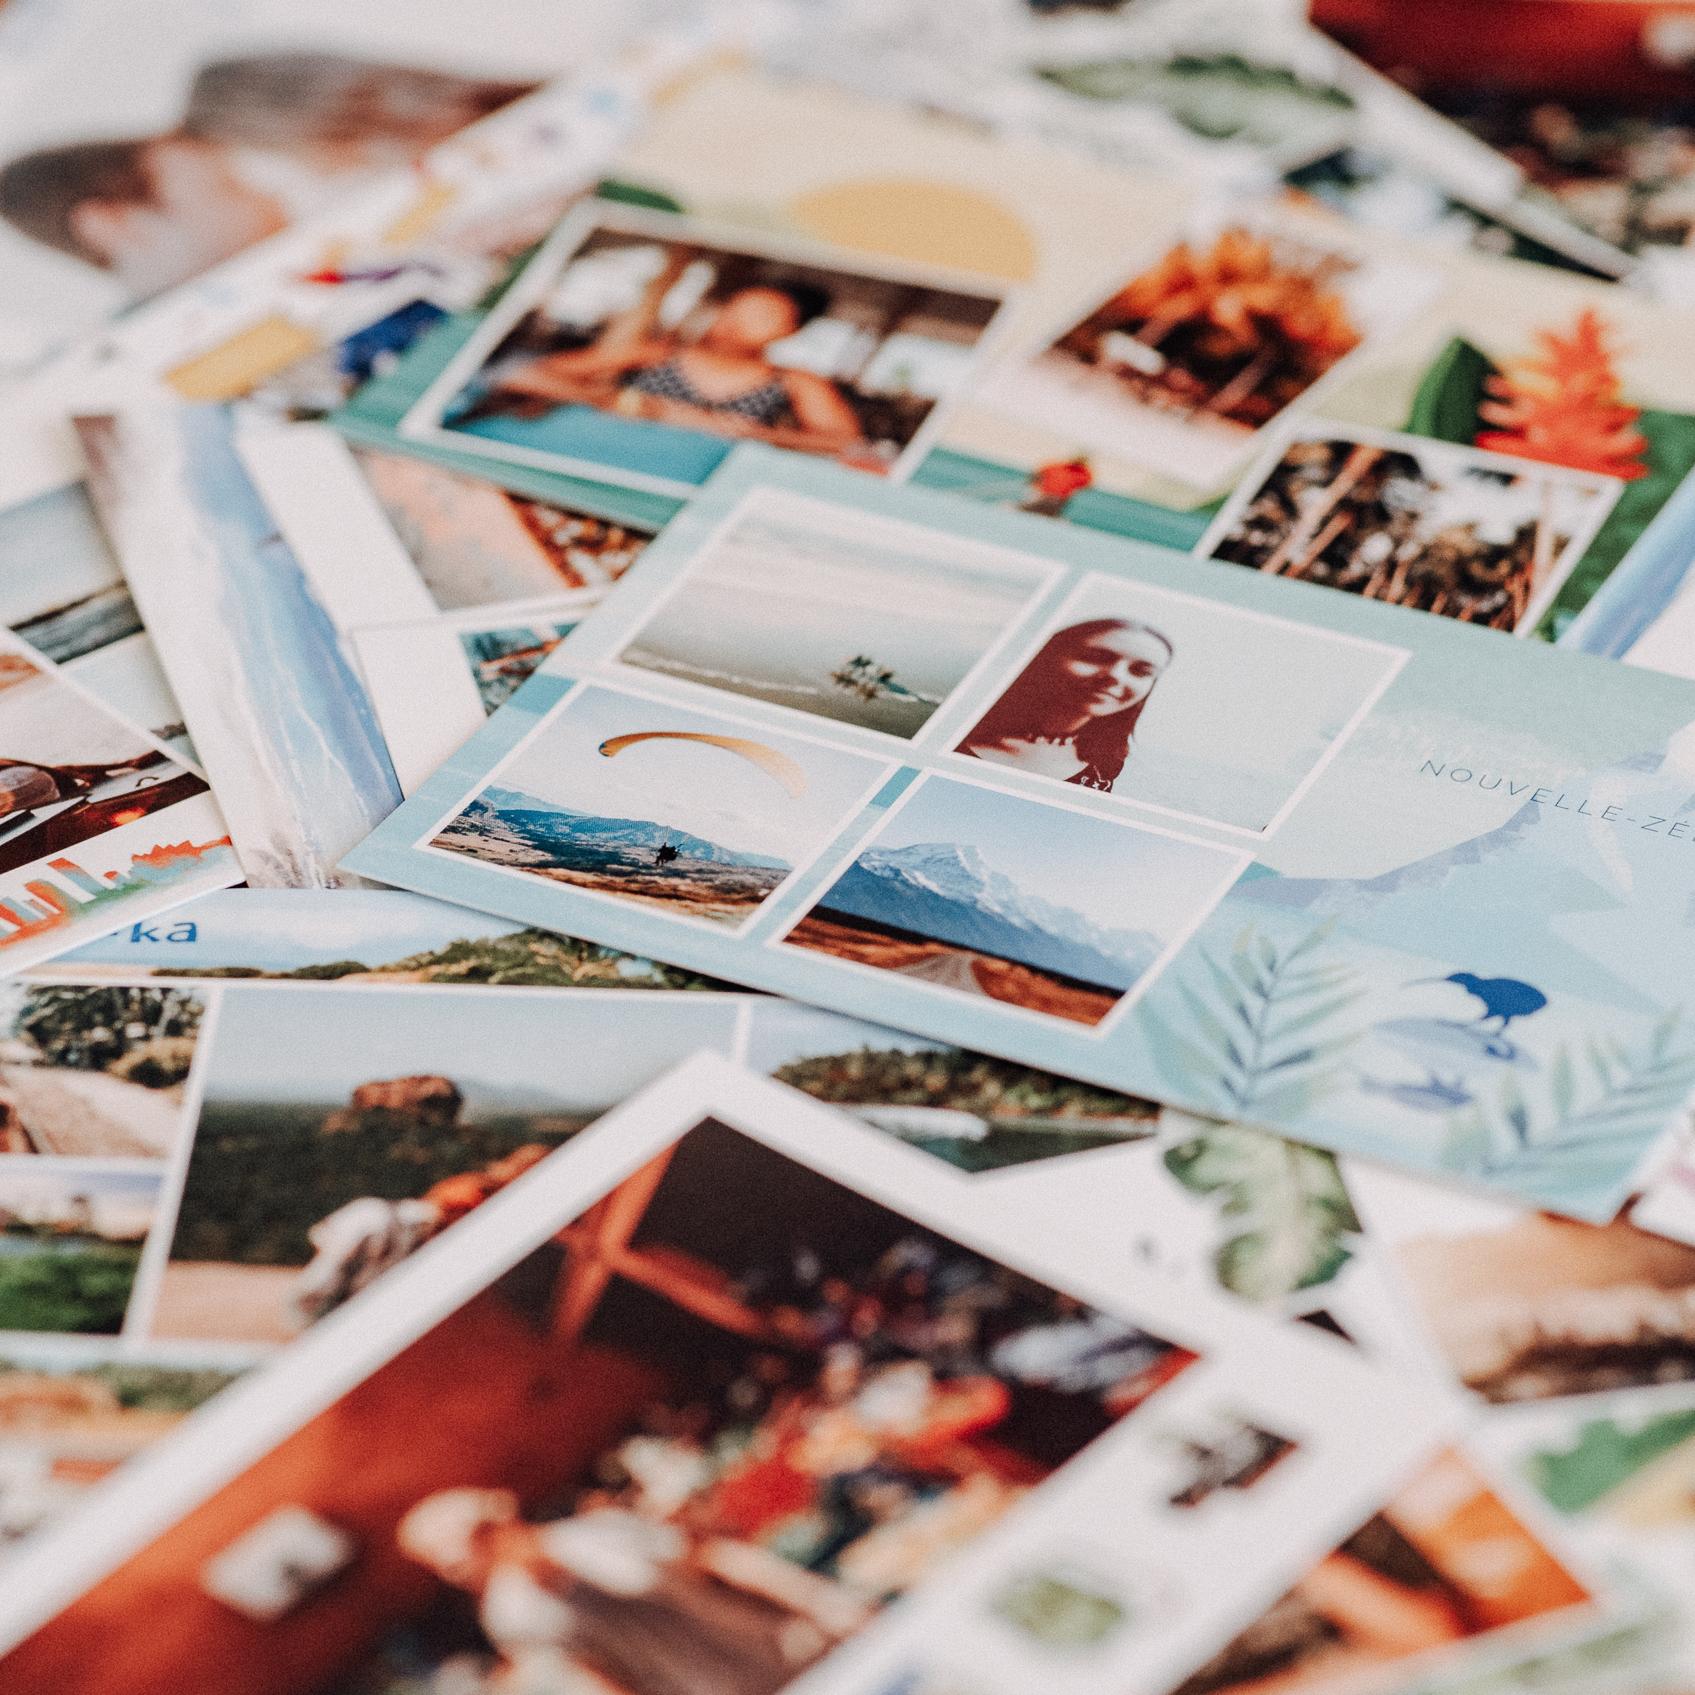 postcards haphazardly arranged